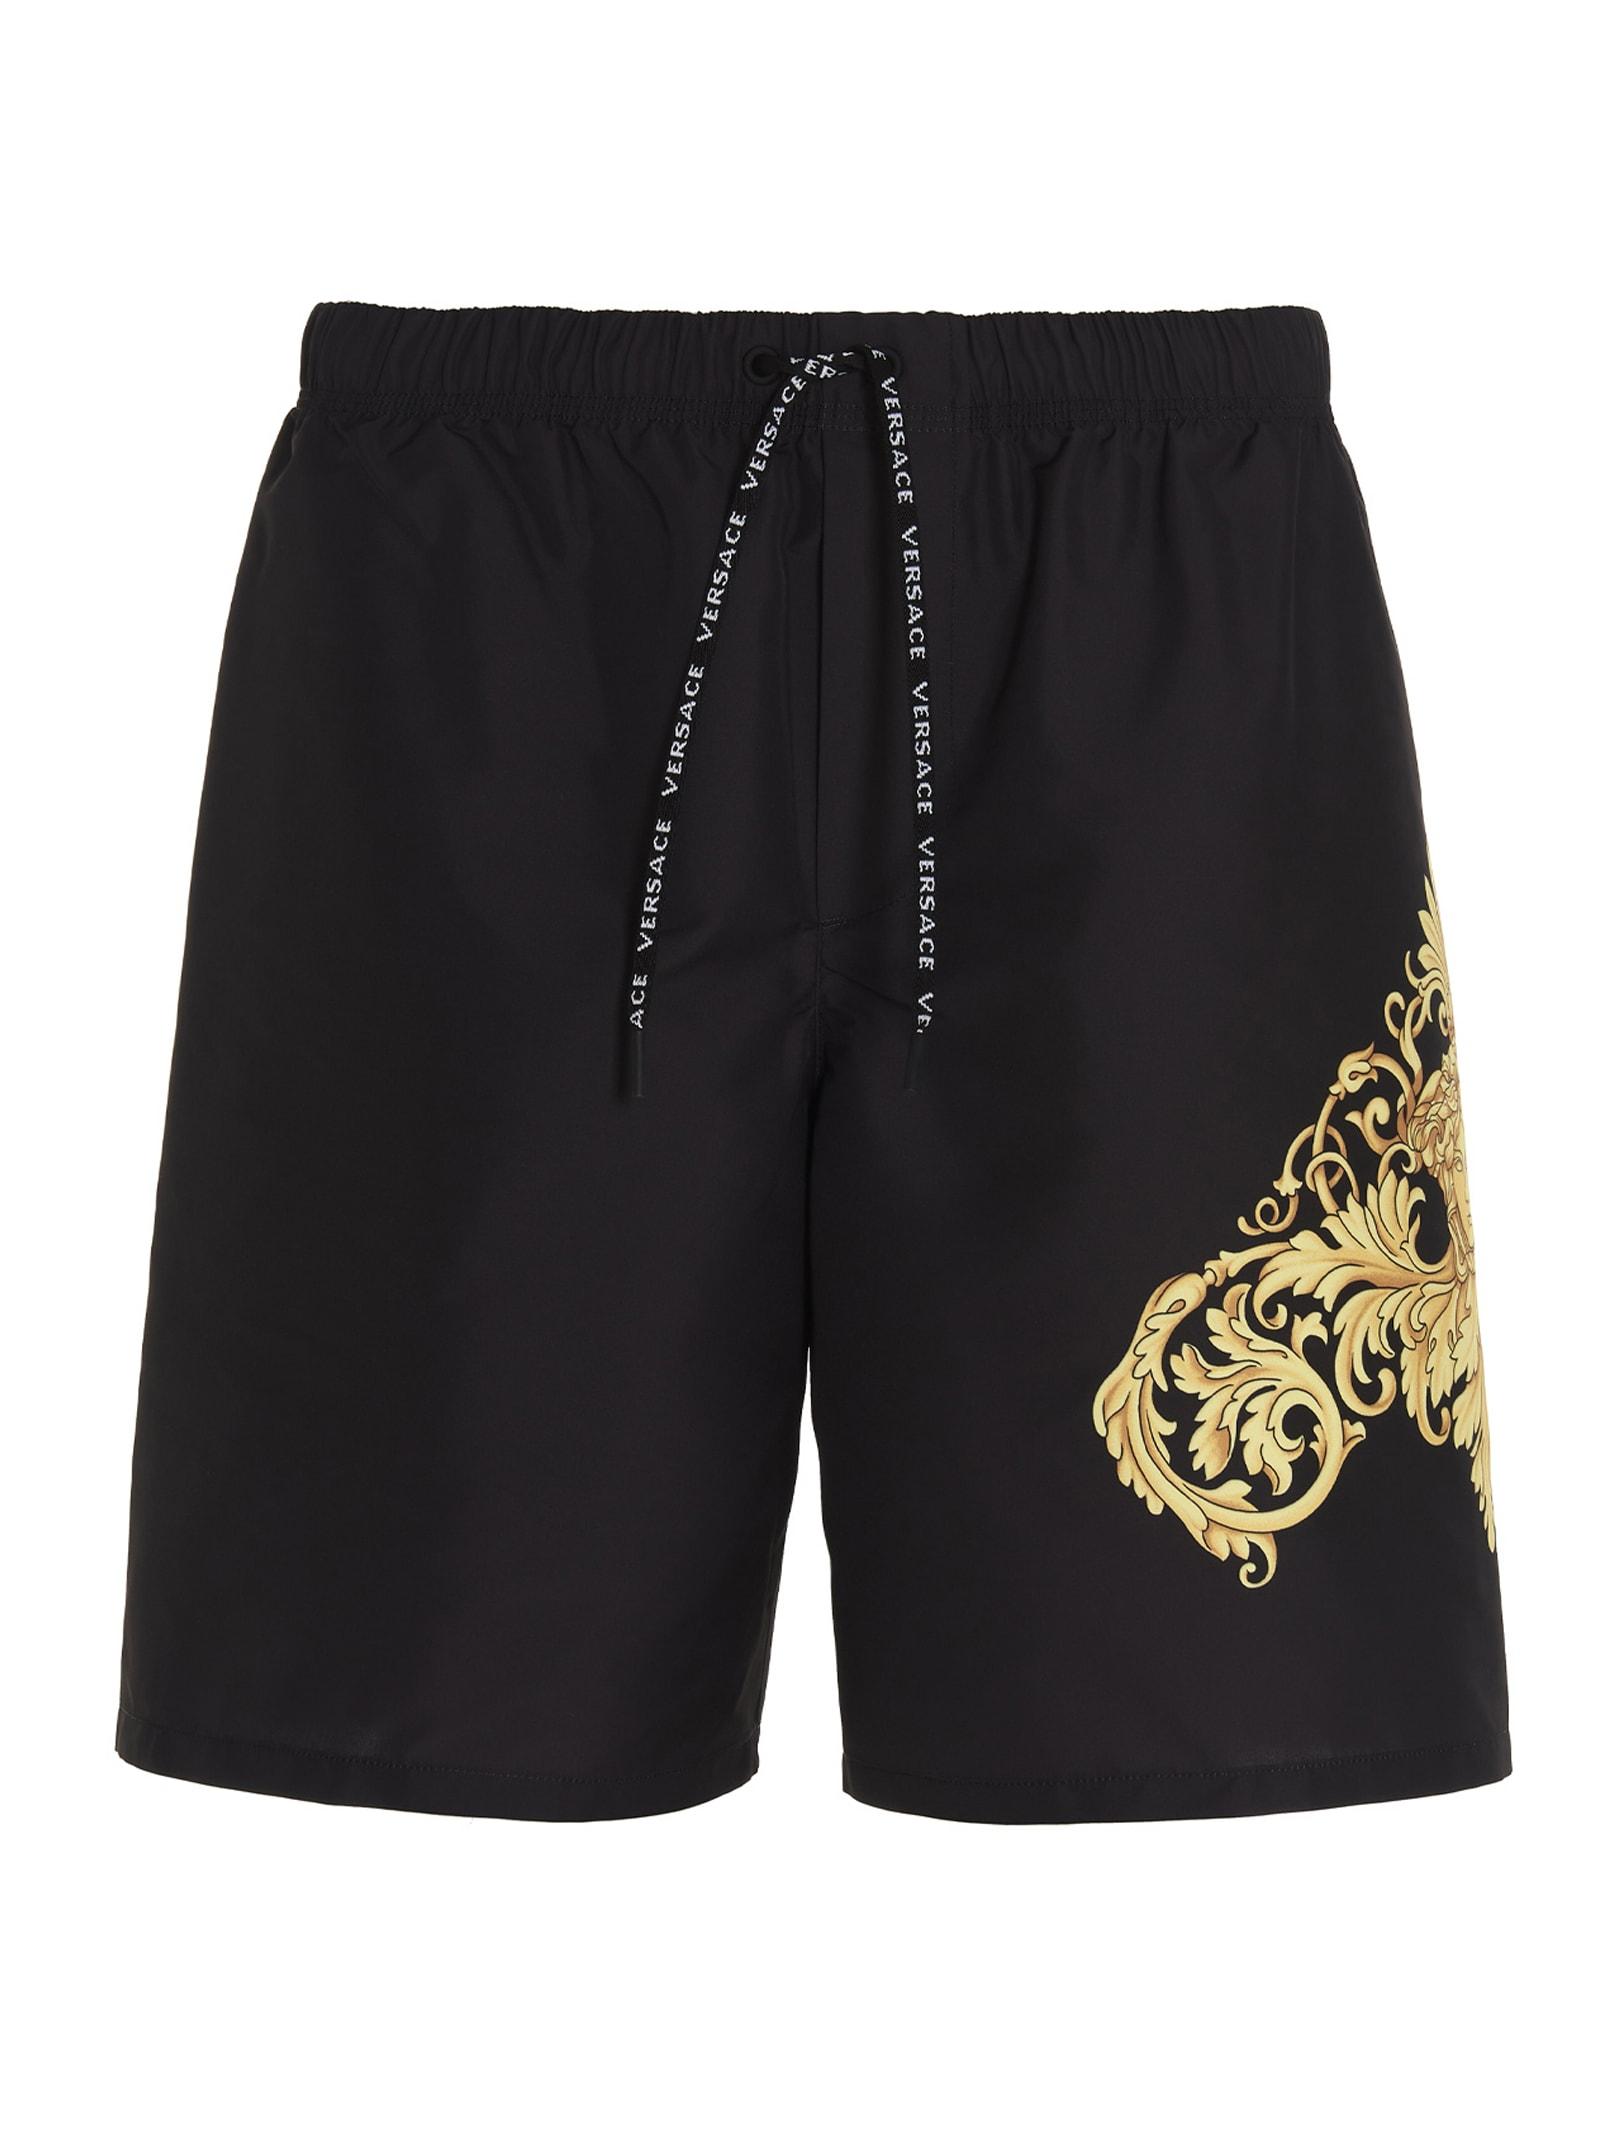 Versace Swimshorts In Black